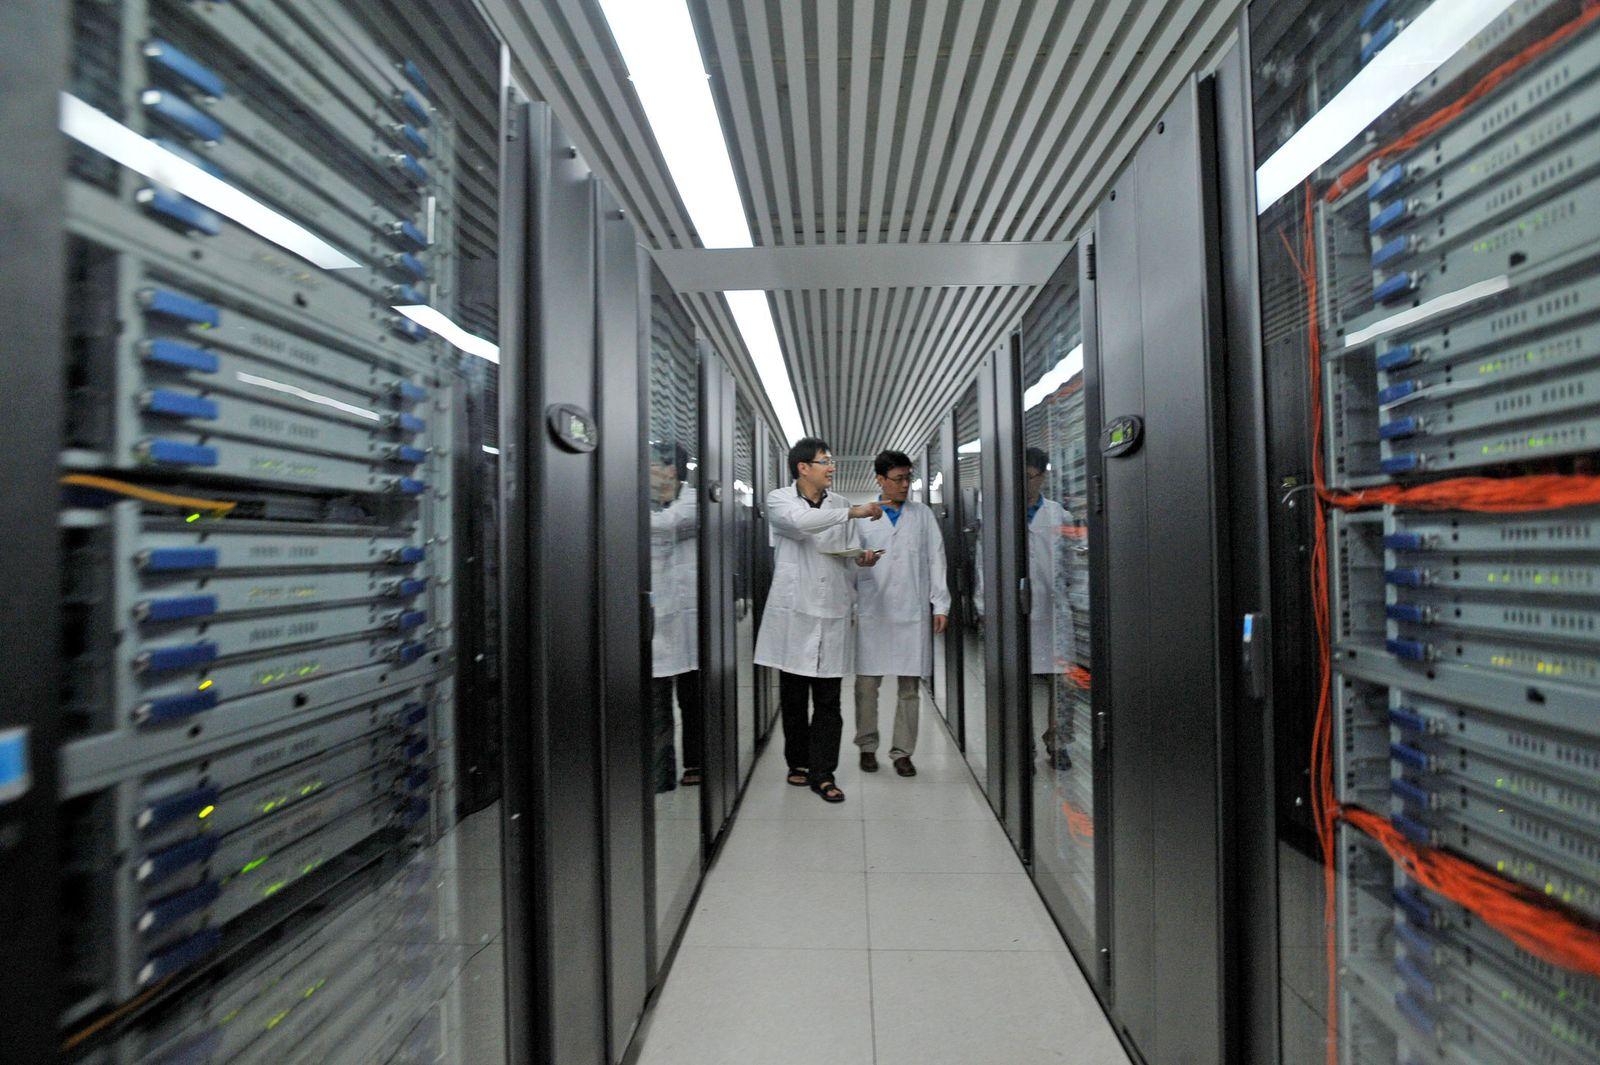 Supercomputer Tinahe 1A